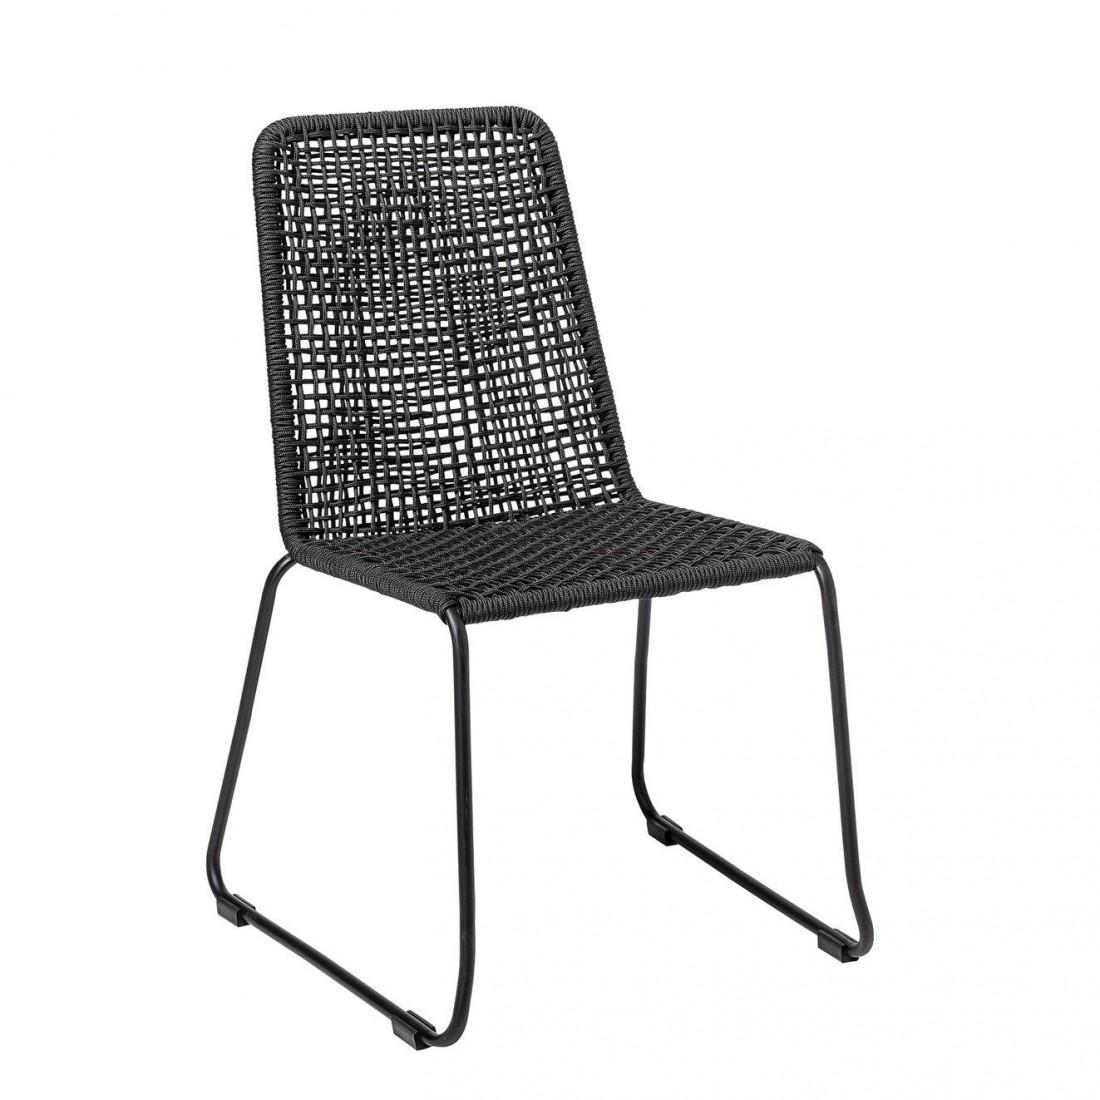 Chaise de jardin Mundo Bloomingville